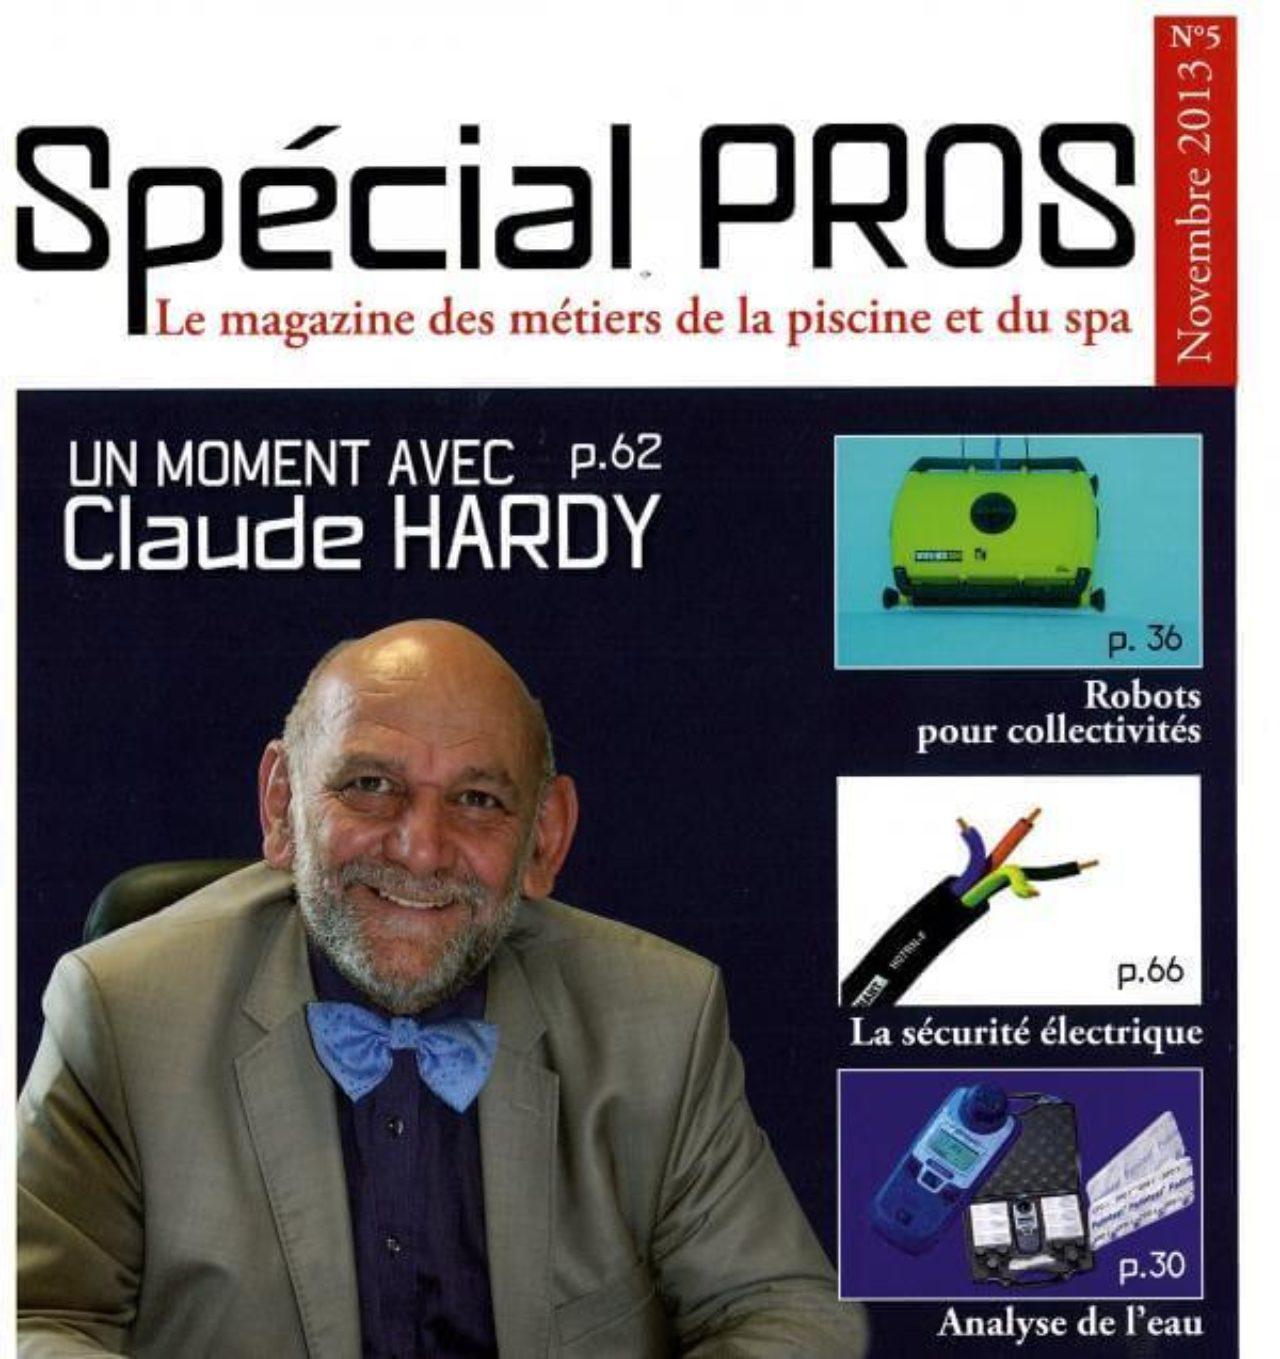 Spécial PROS 05/2013 | Blog - Microwell